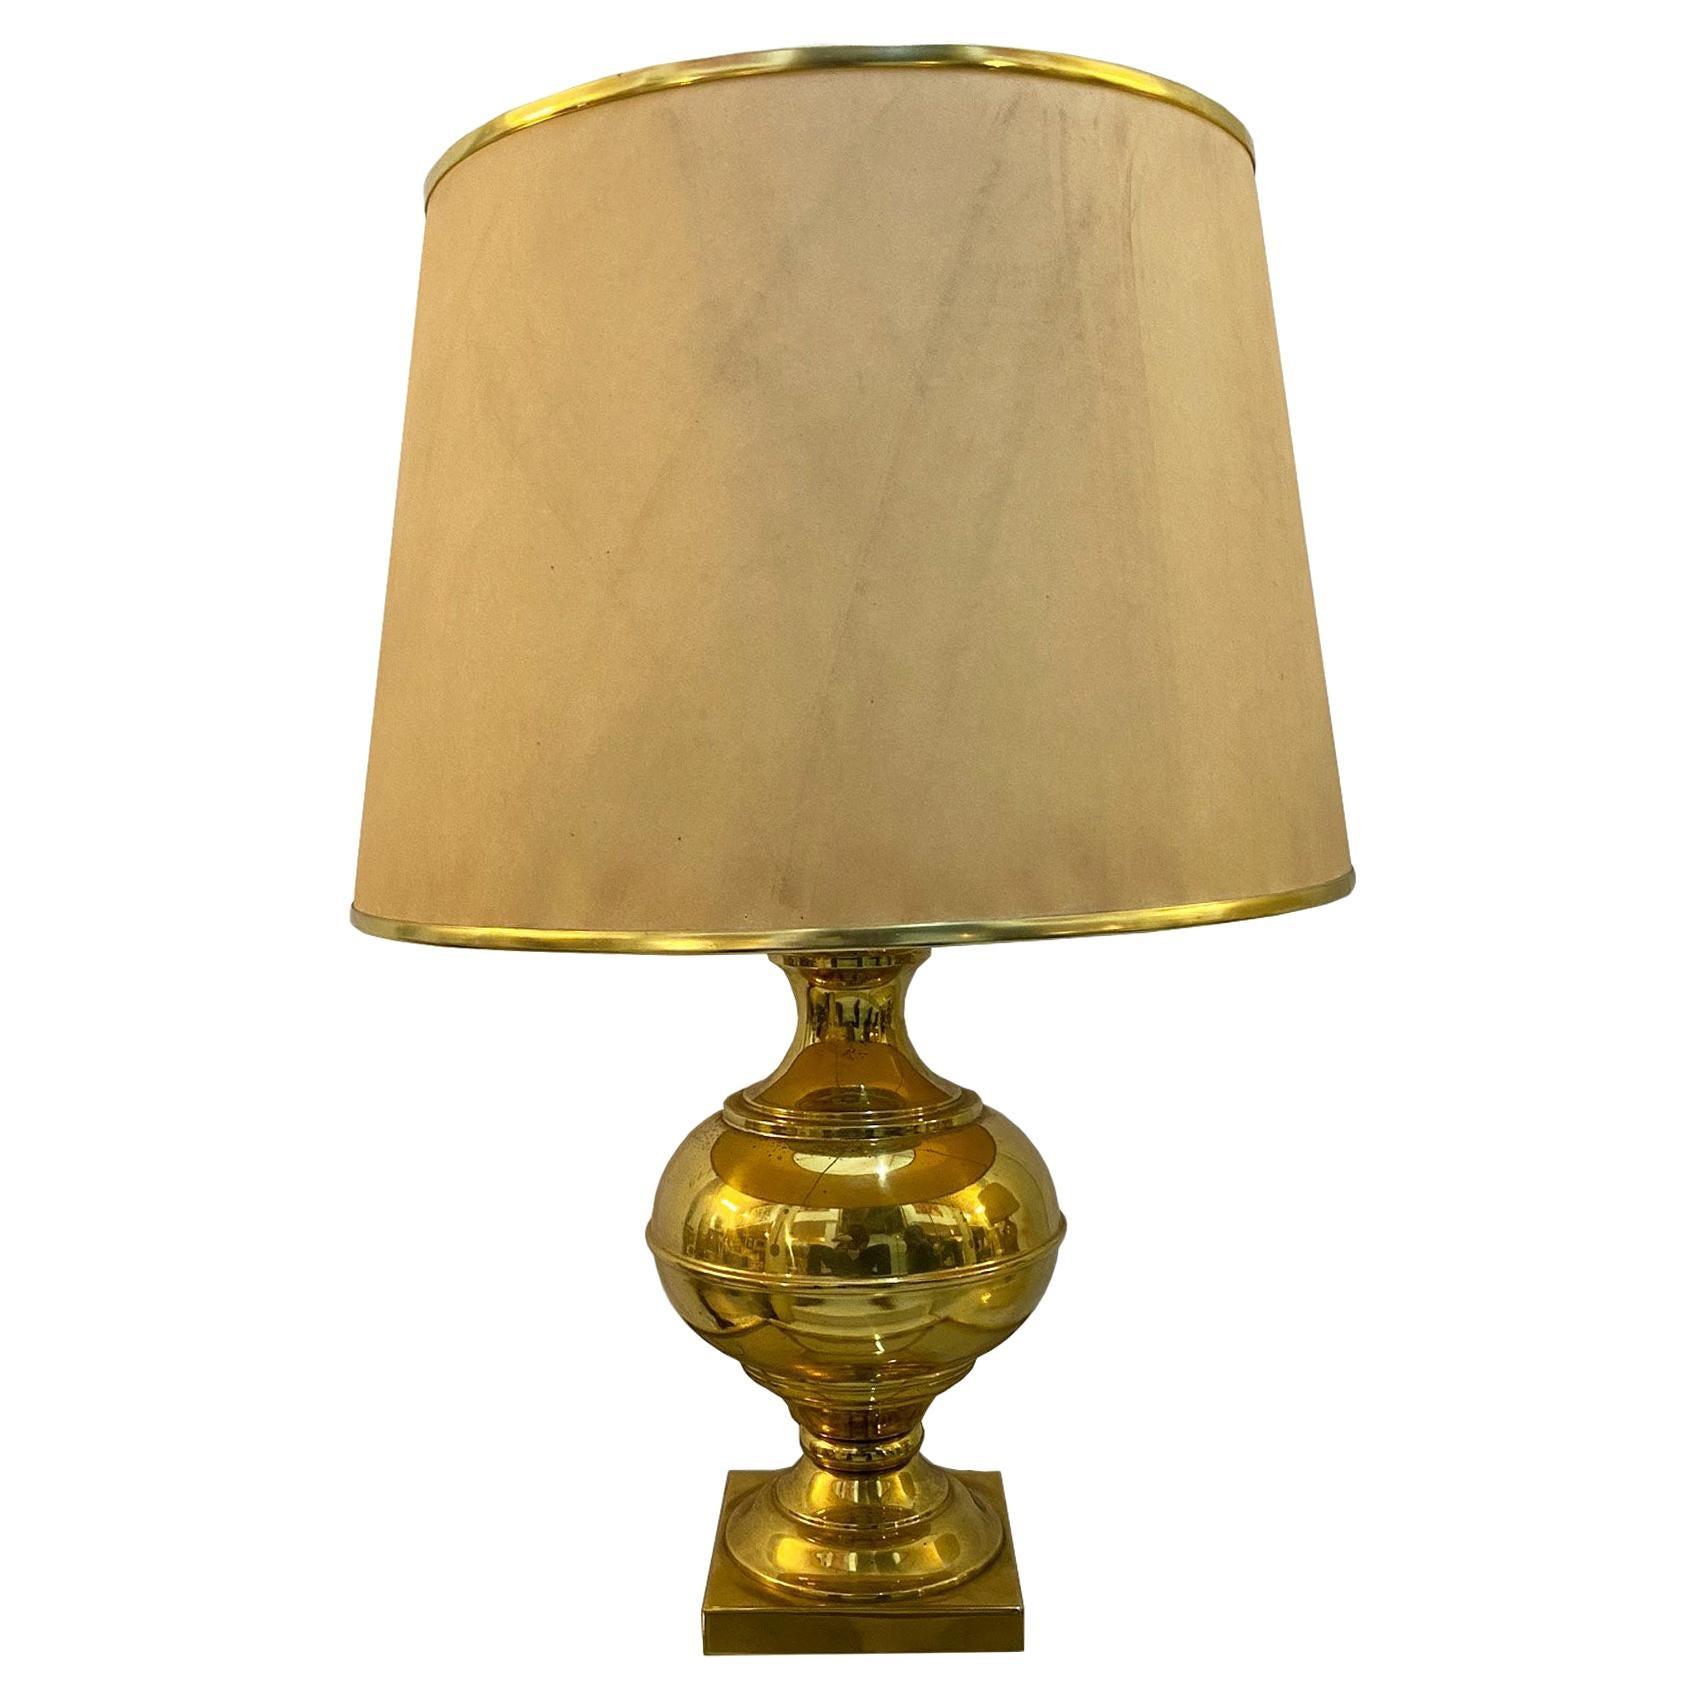 Elegant Brass Table Lamp, Italy, 1960s